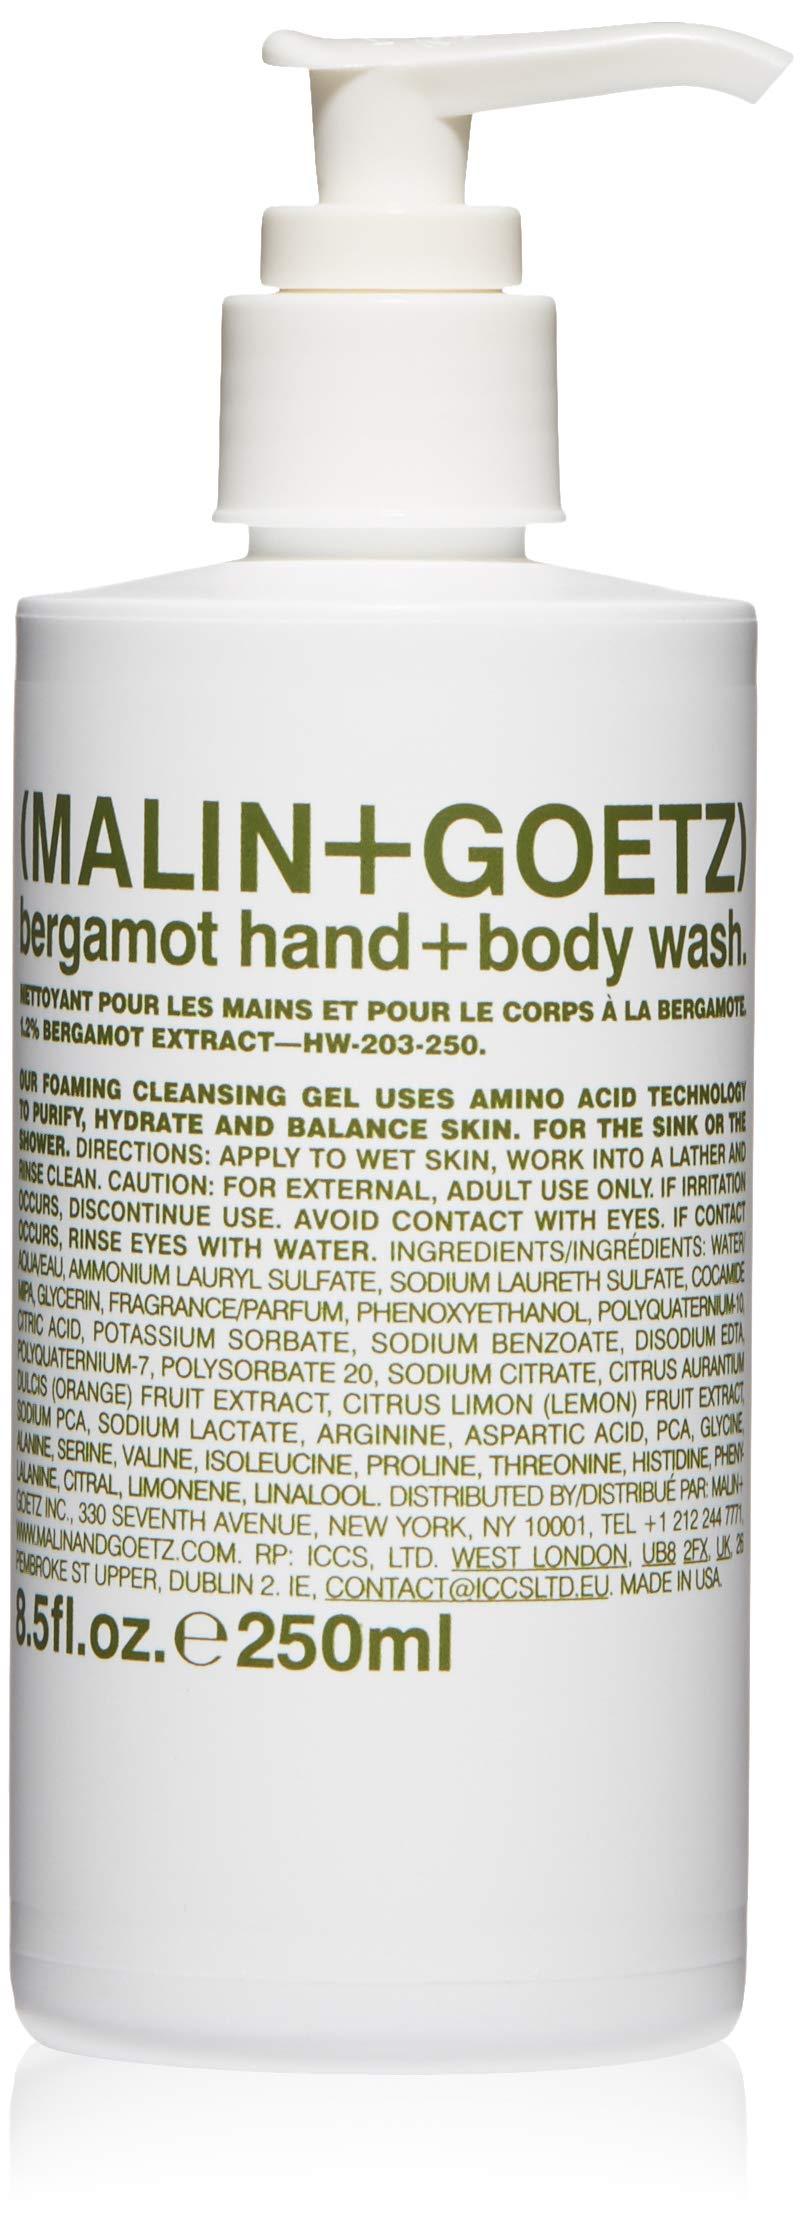 Malin + Goetz Bergamot Hand+Body Wash, 8.5 Fl Oz